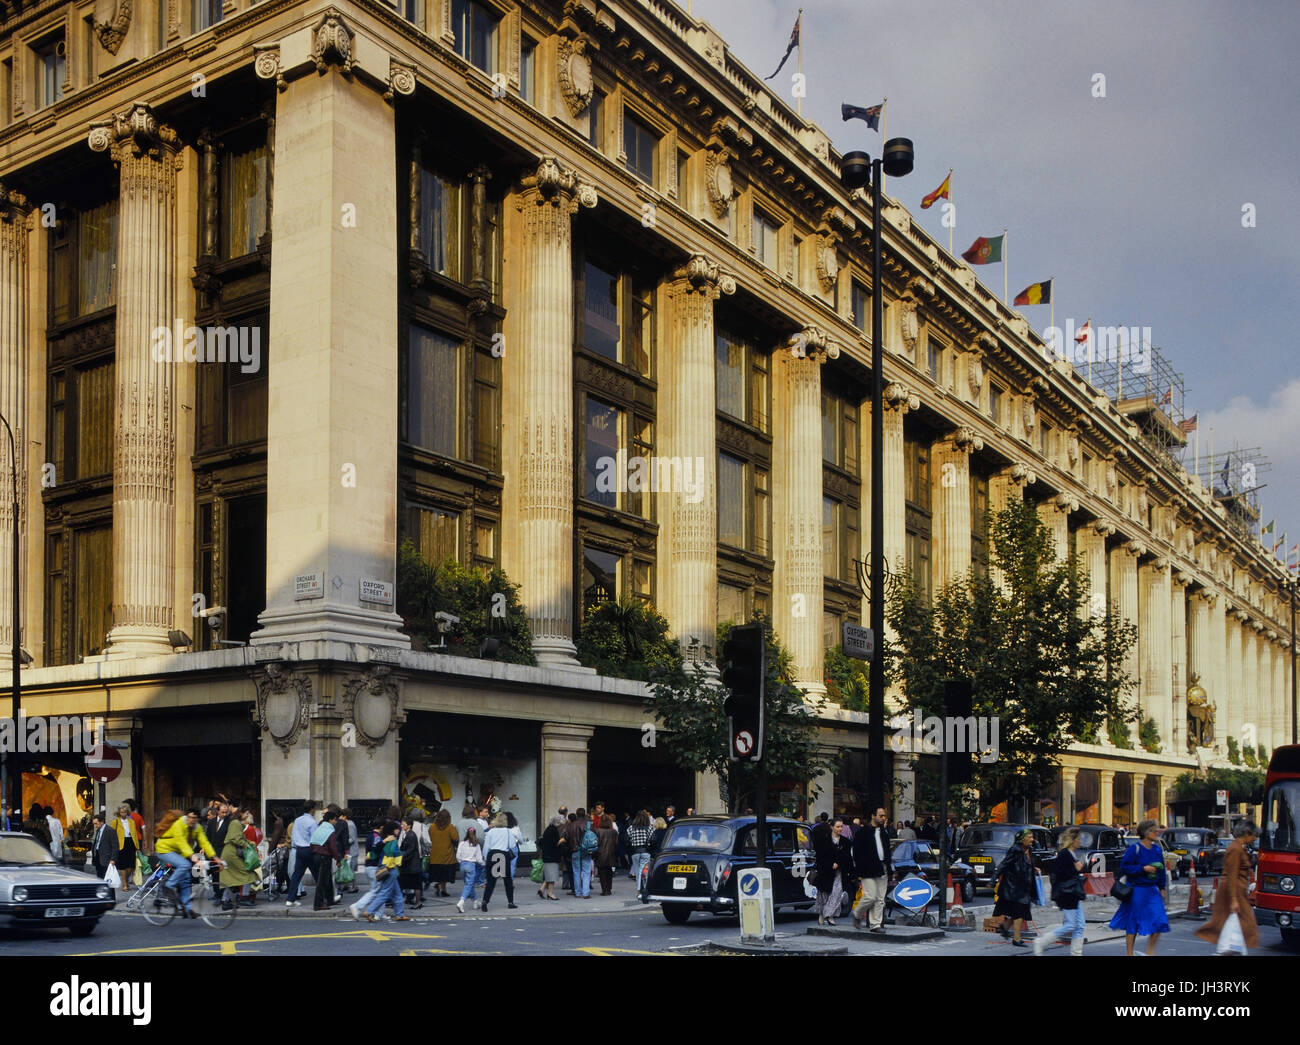 Selfridges department store, Oxford Street, London, England, UK. Circa 1980's - Stock Image